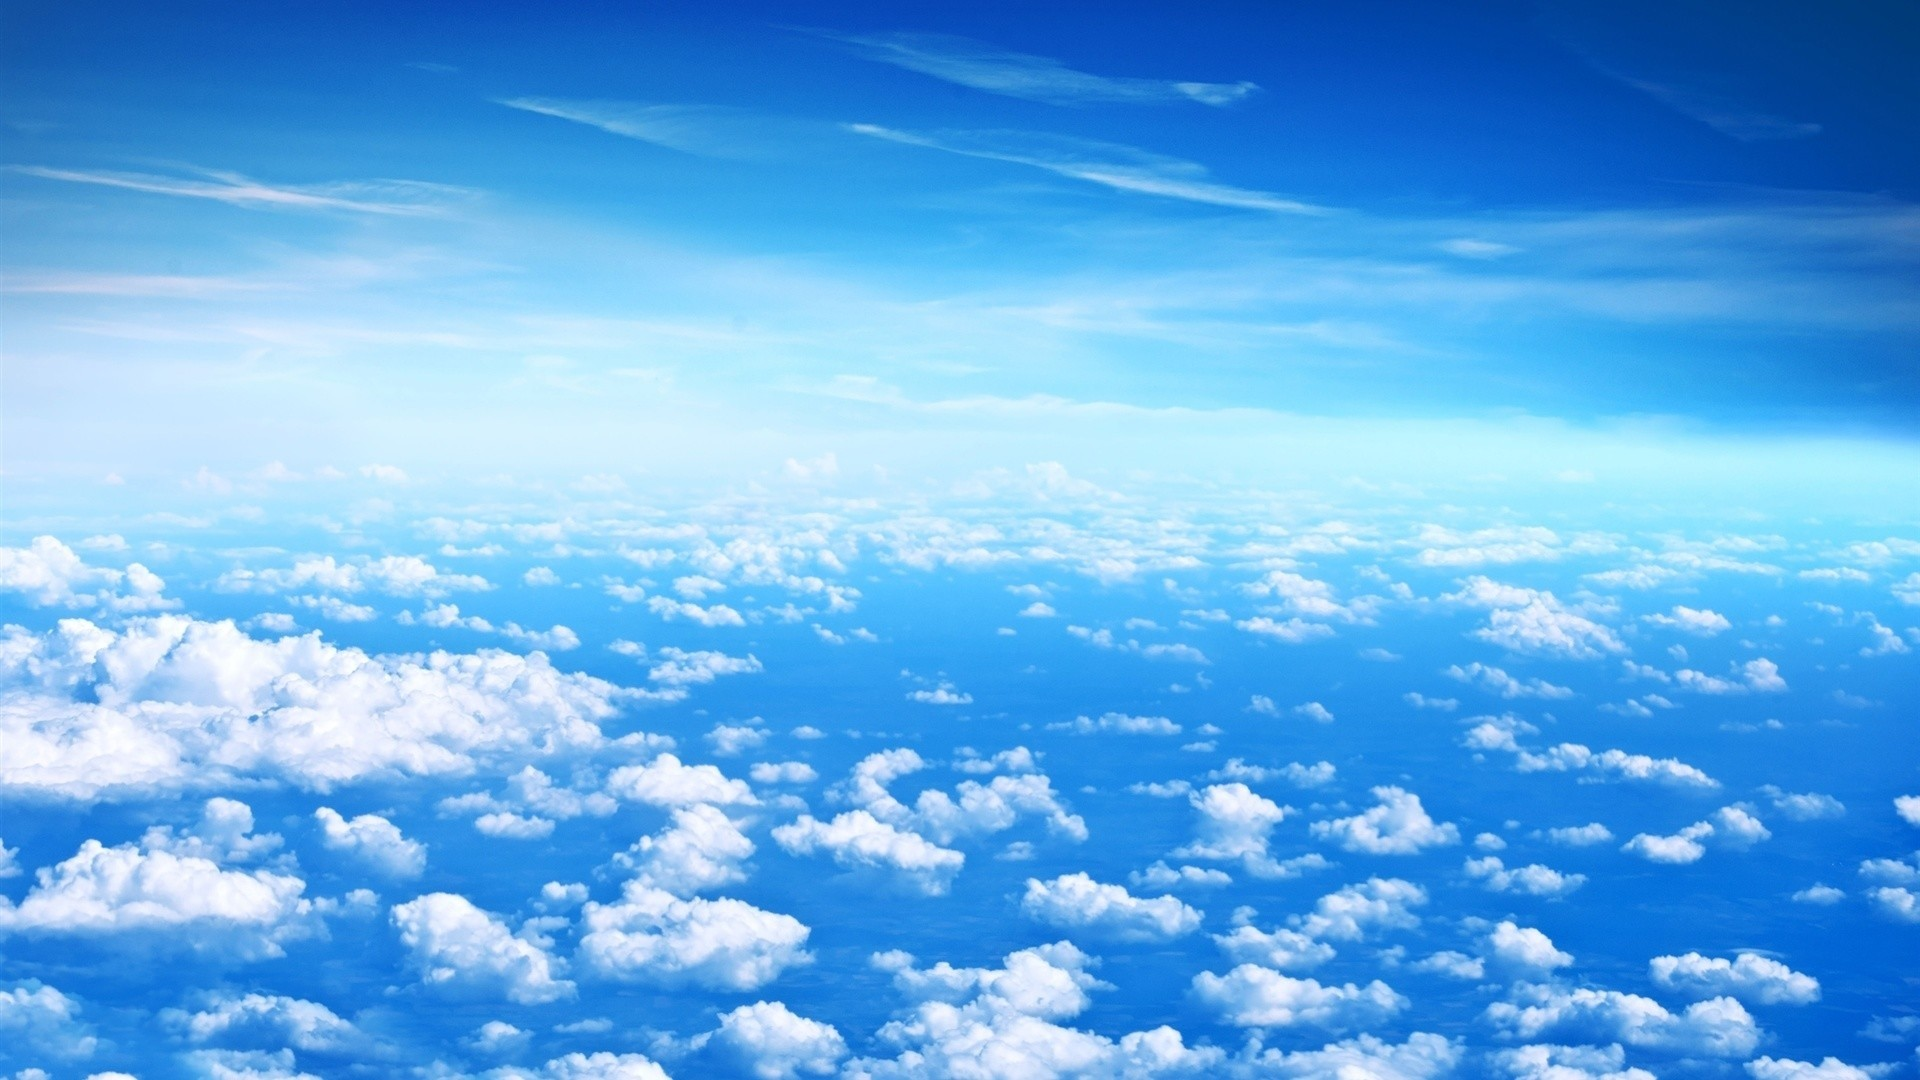 Blue Cloud PC Wallpaper HD